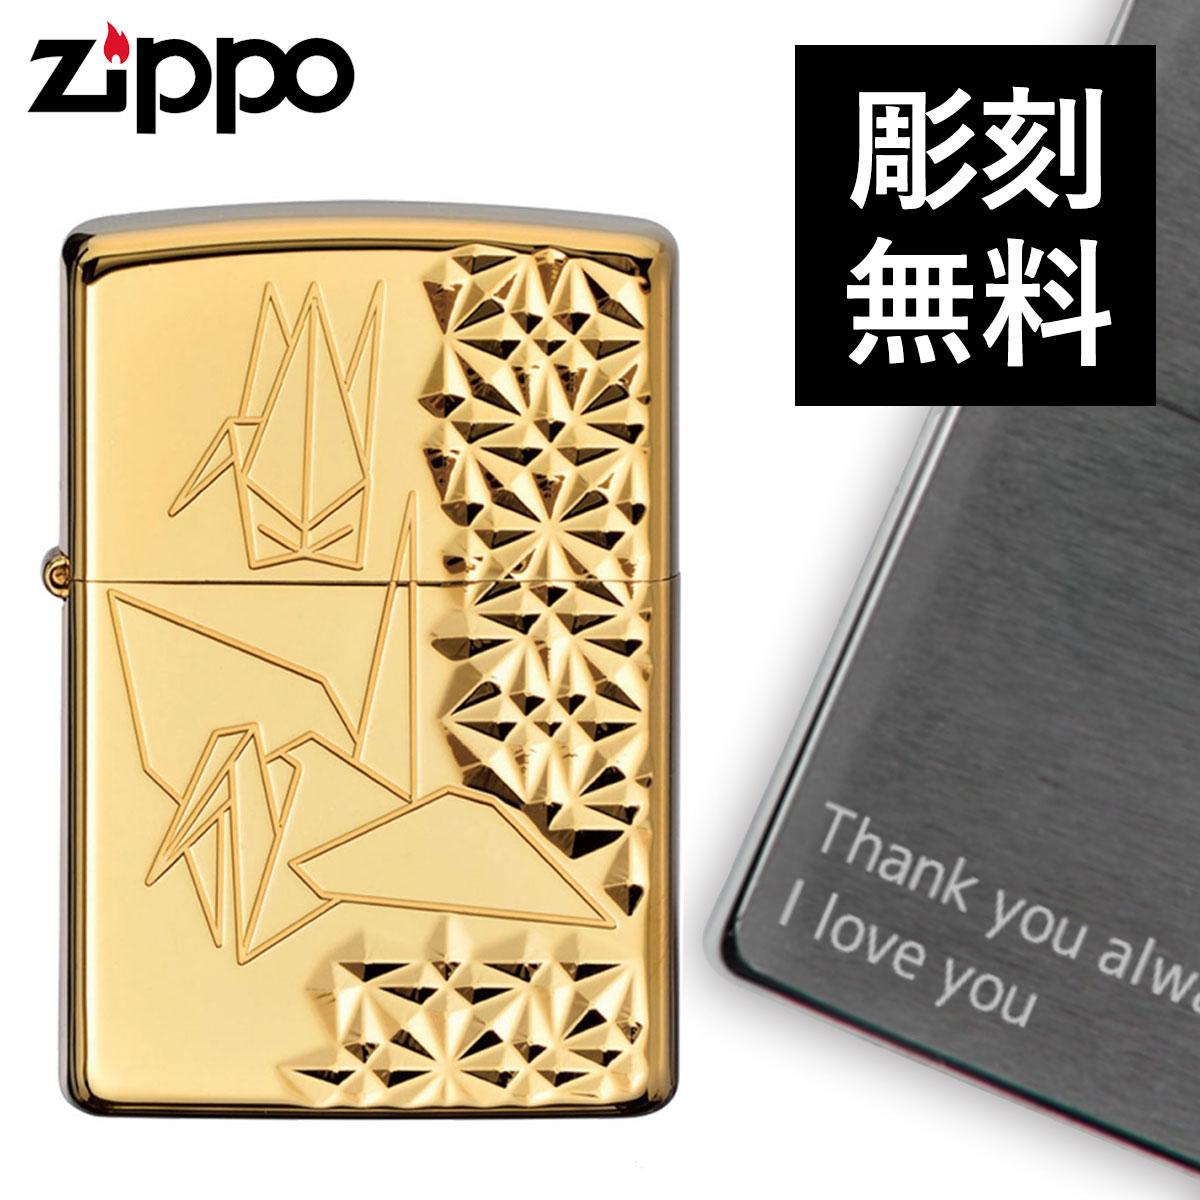 zippo ジッポー ライター Zippoライター ジッポライター 金チタンZ #2 名入れ ギフト